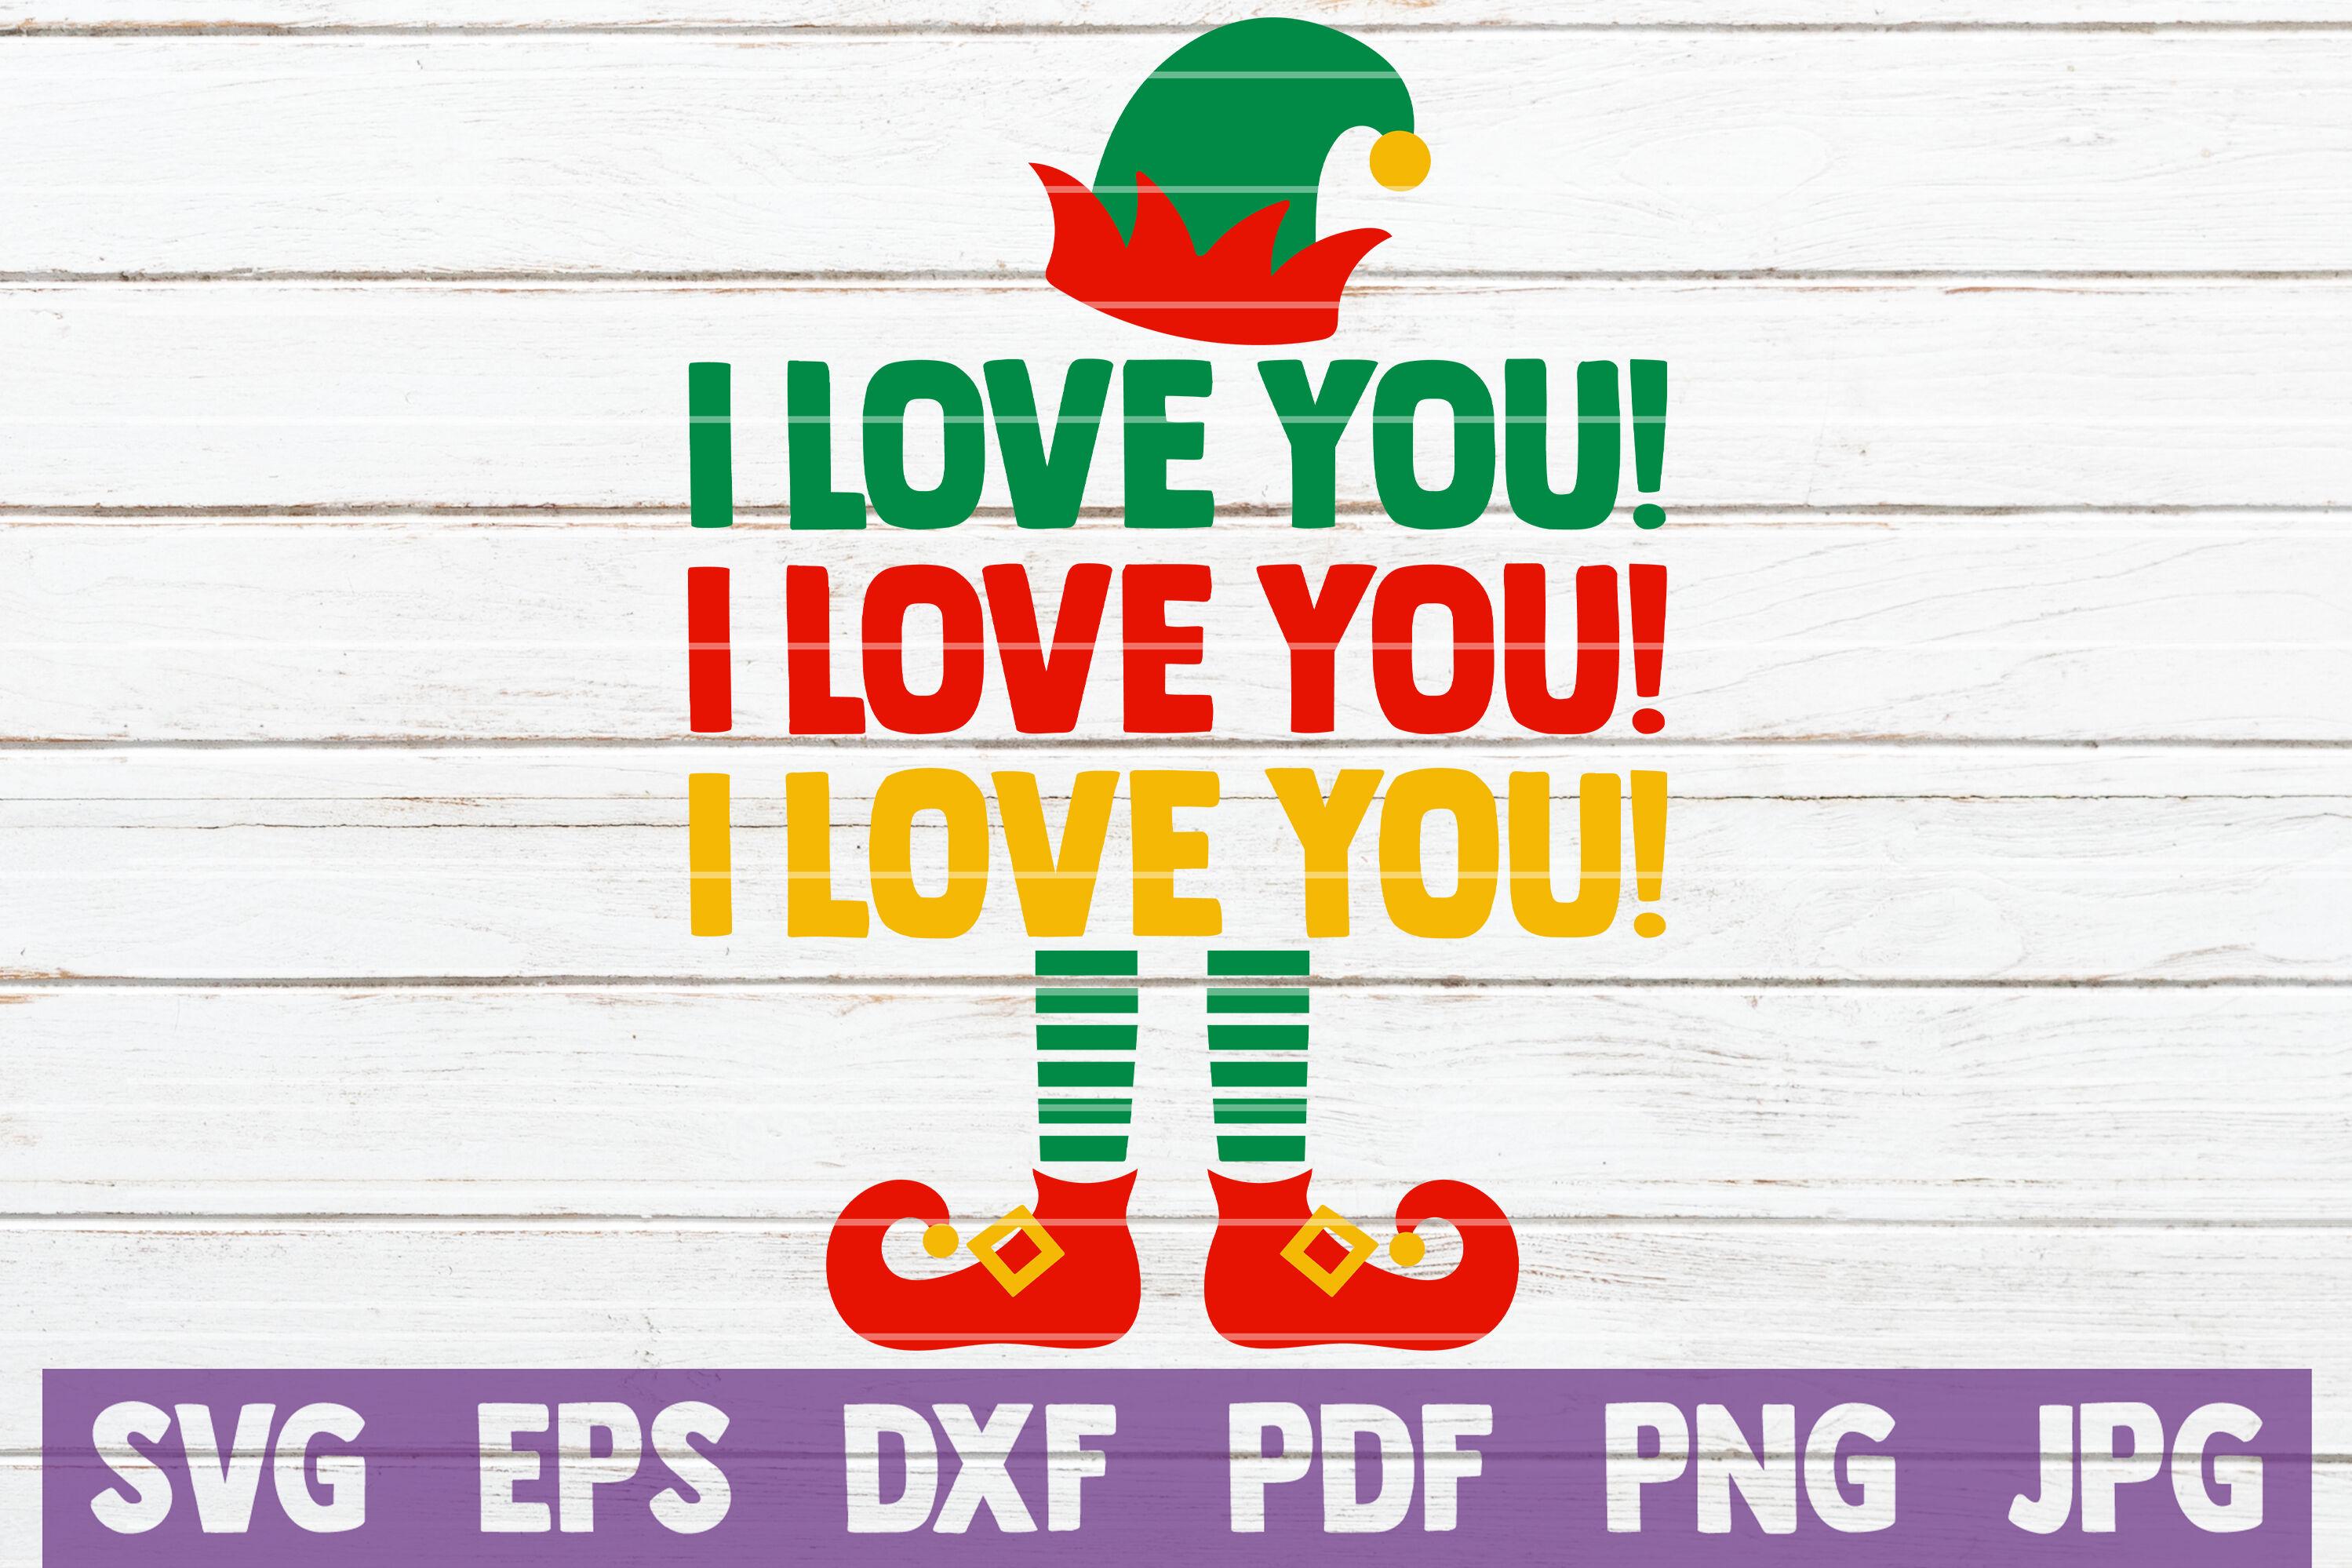 I Love You I Love You I Love You Svg Cut File By